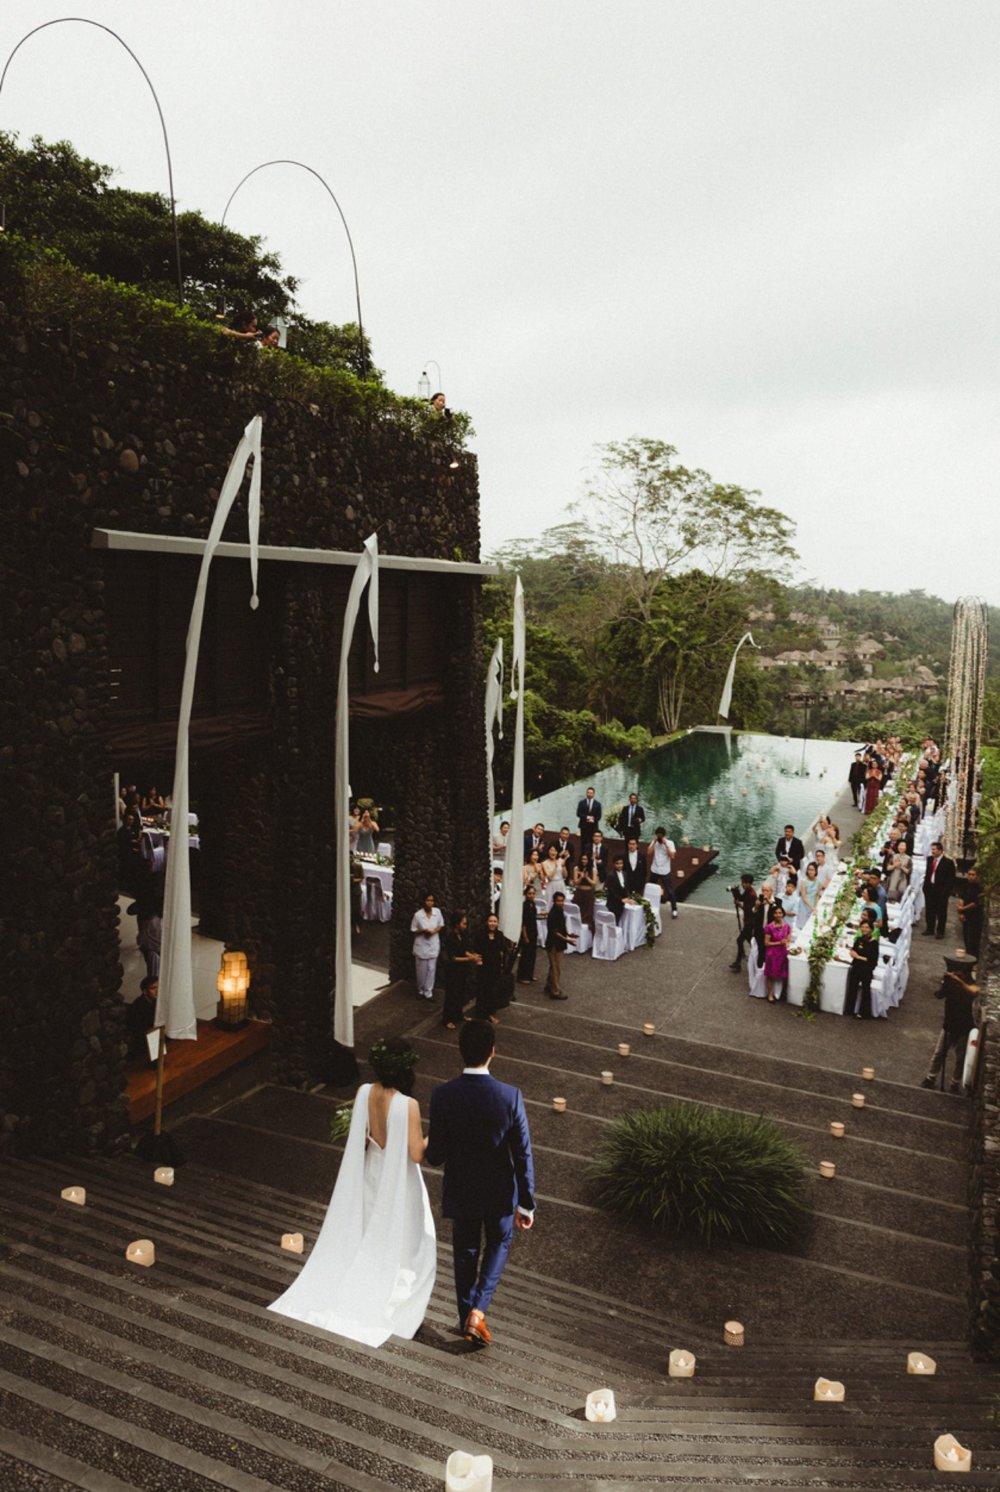 Tim-Danika-Bali-Wedding-Pyara-Photo-Evans 40.jpg